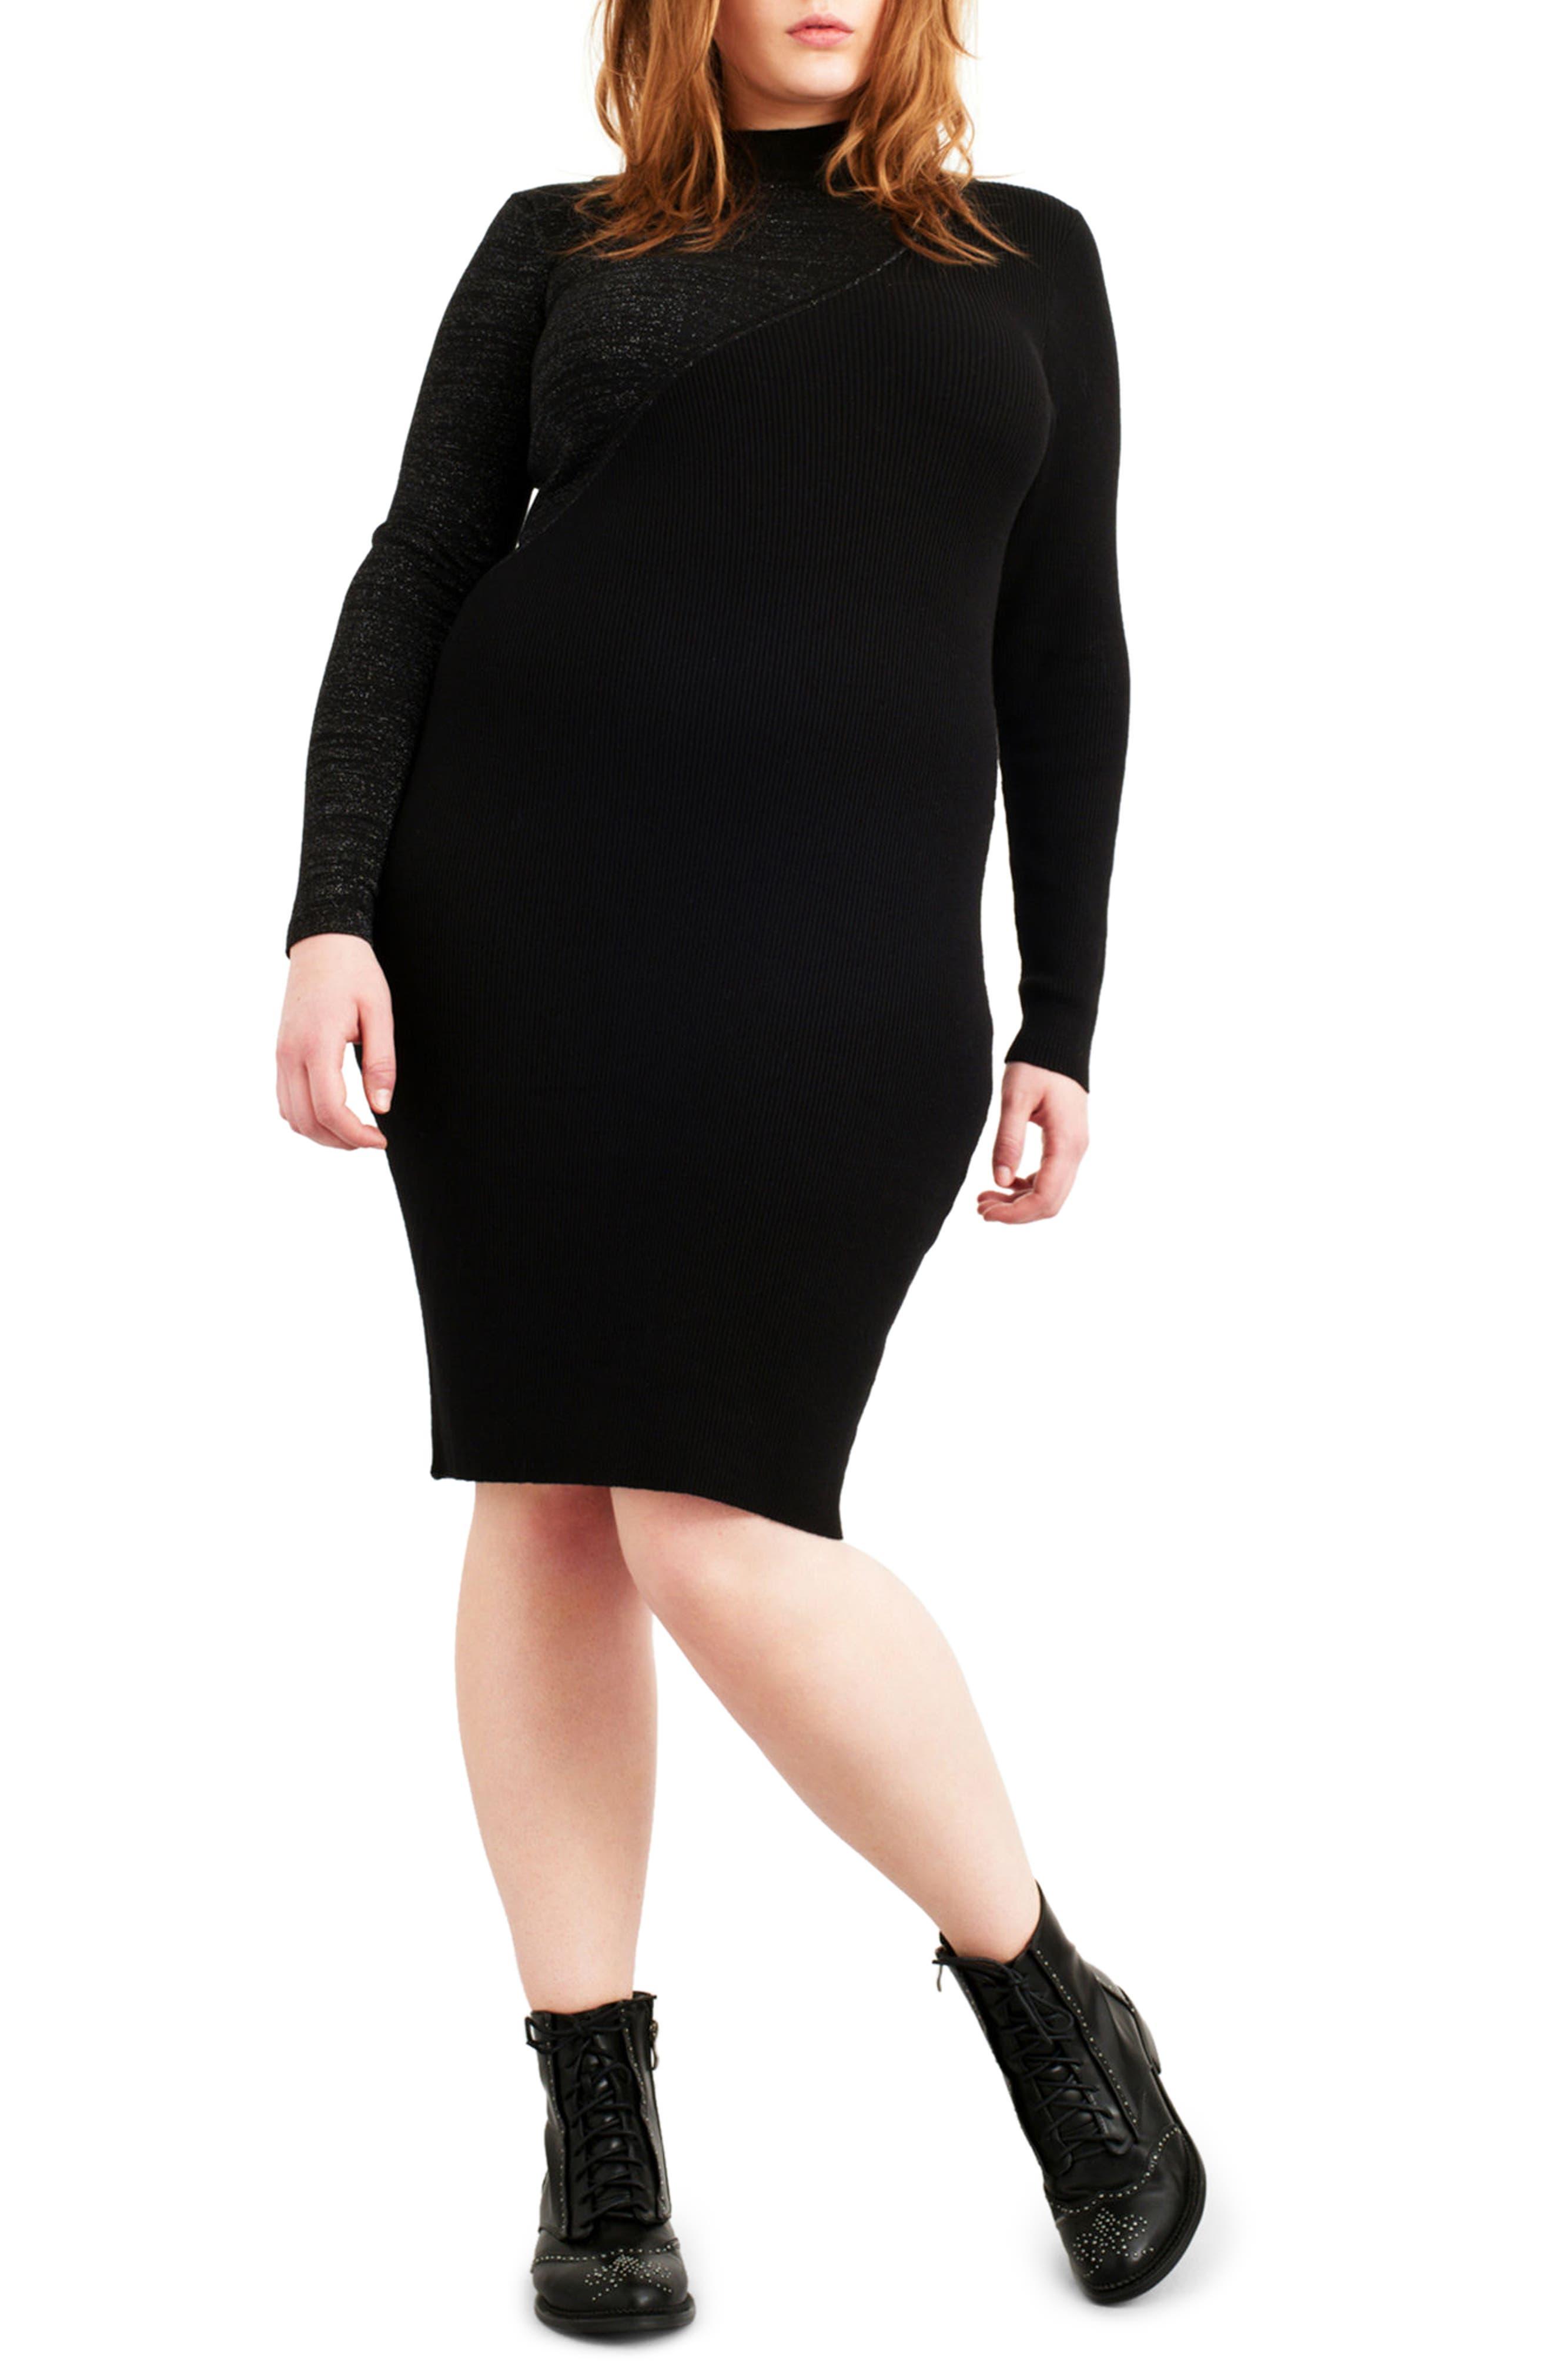 Main Image - LOST INK Glitter Colorblock Knit Body-Con Dress